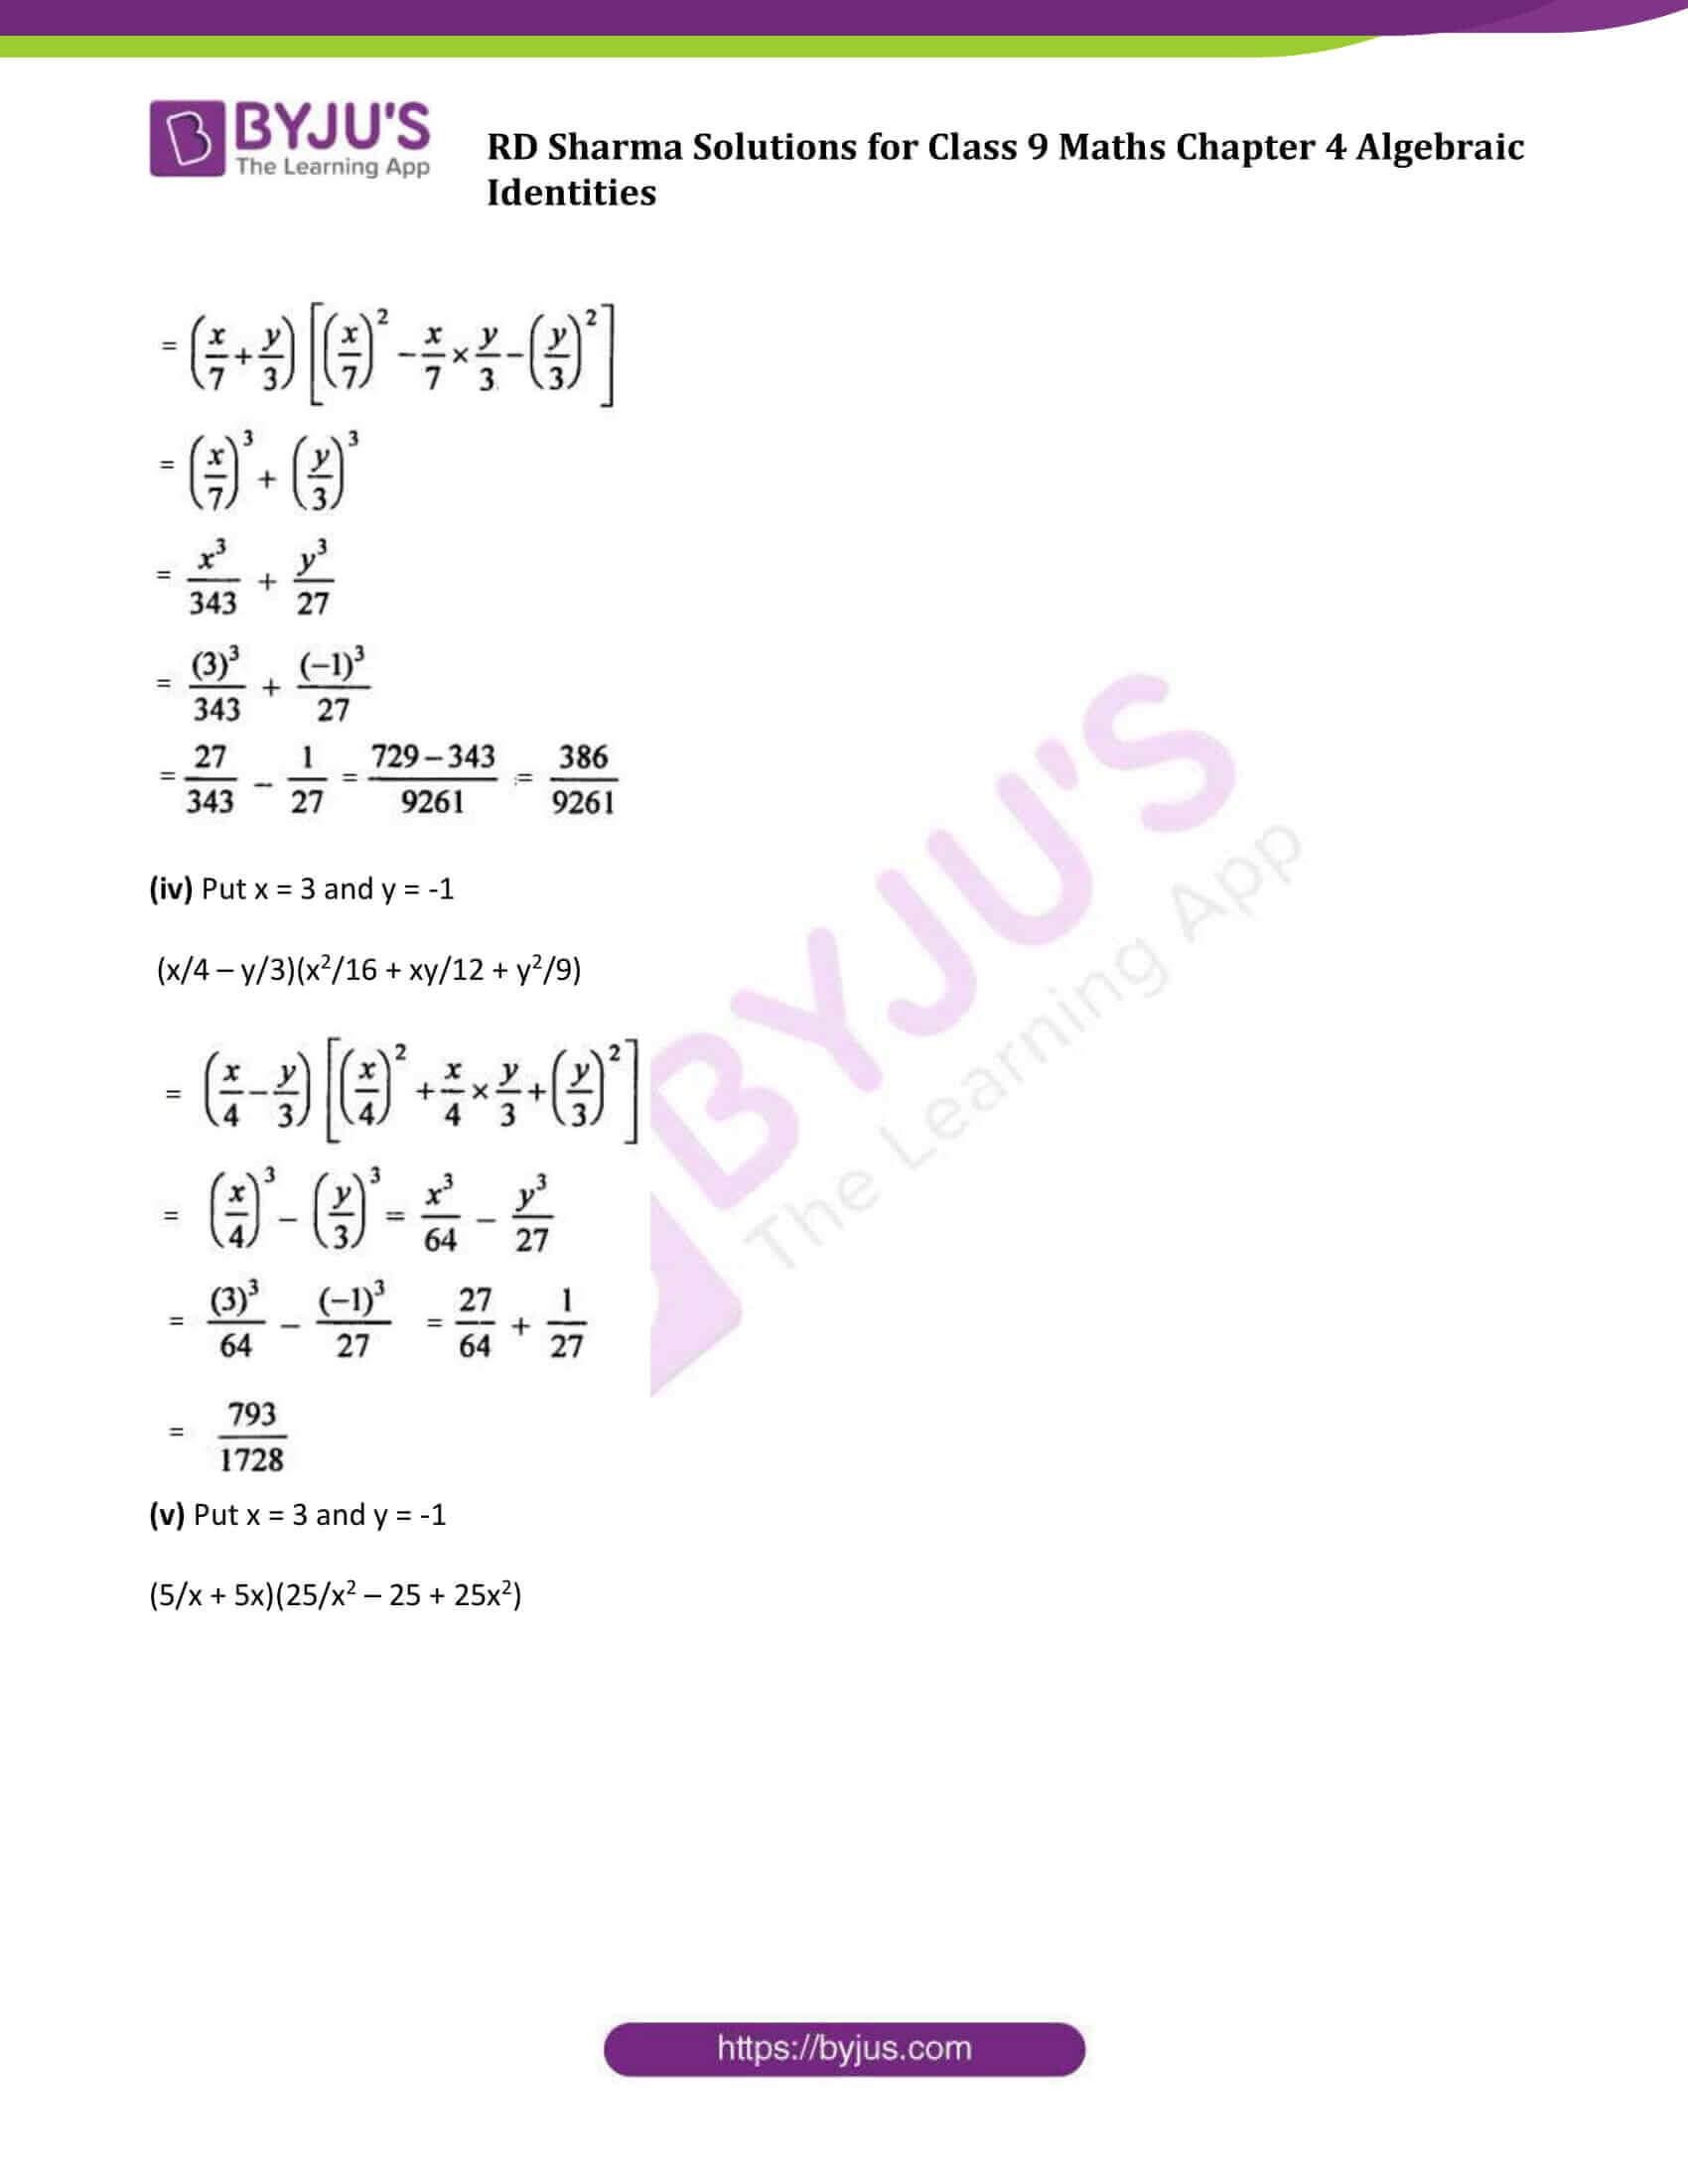 RD Sharma Solution class 9 Maths Chapter 4 Algebraic Identities 23